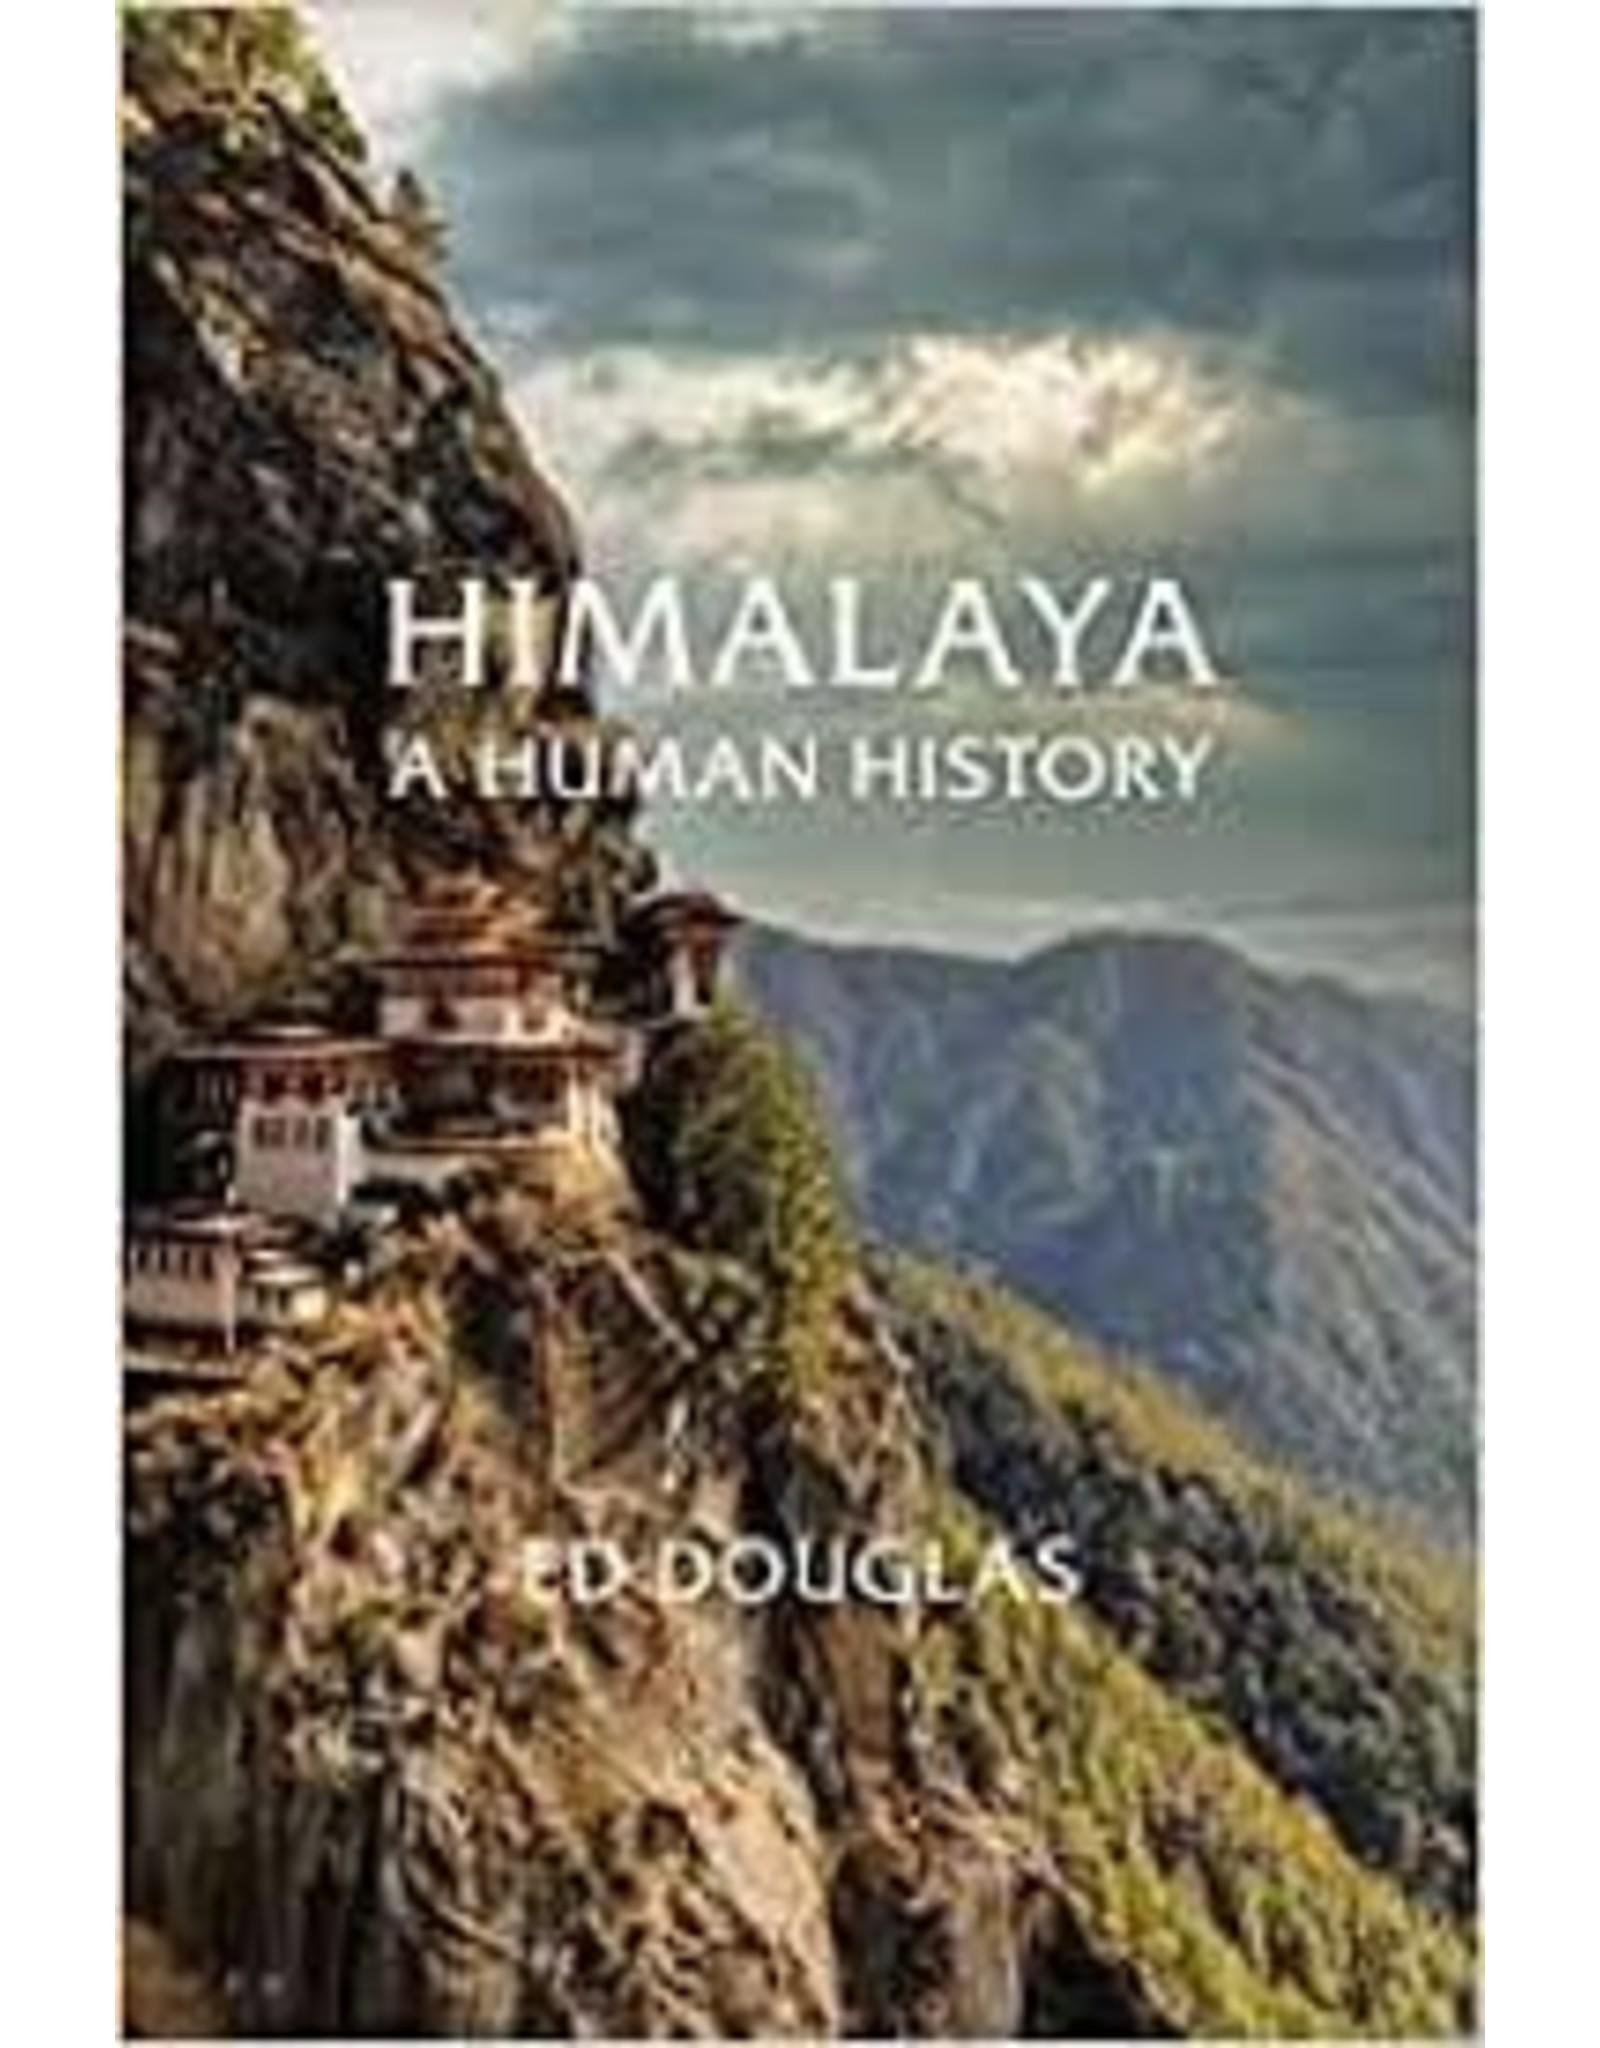 Books Himalaya: A Human History by Ed Douglas